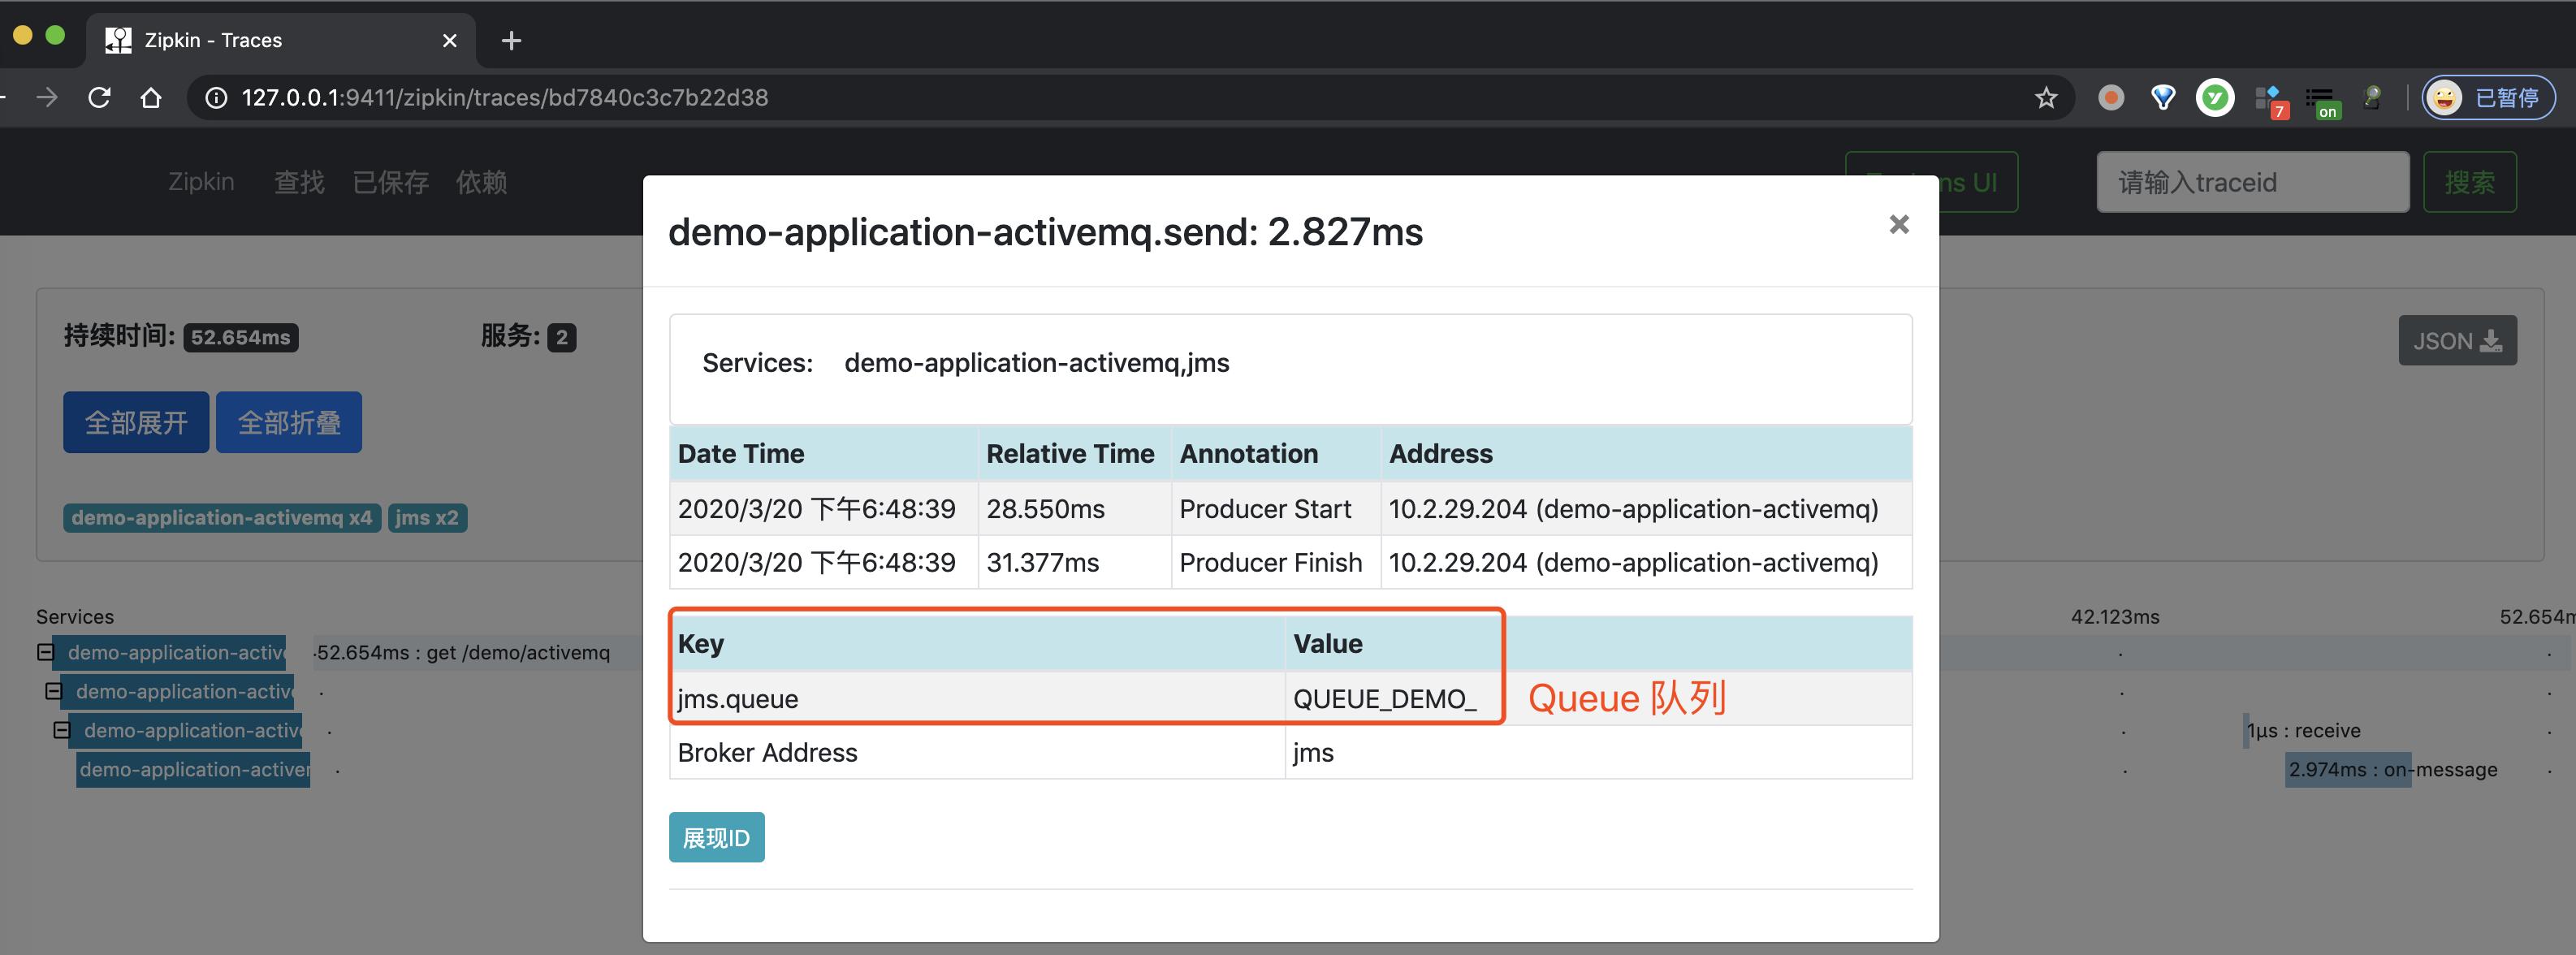 Zipkin UI —— Span 数据明细